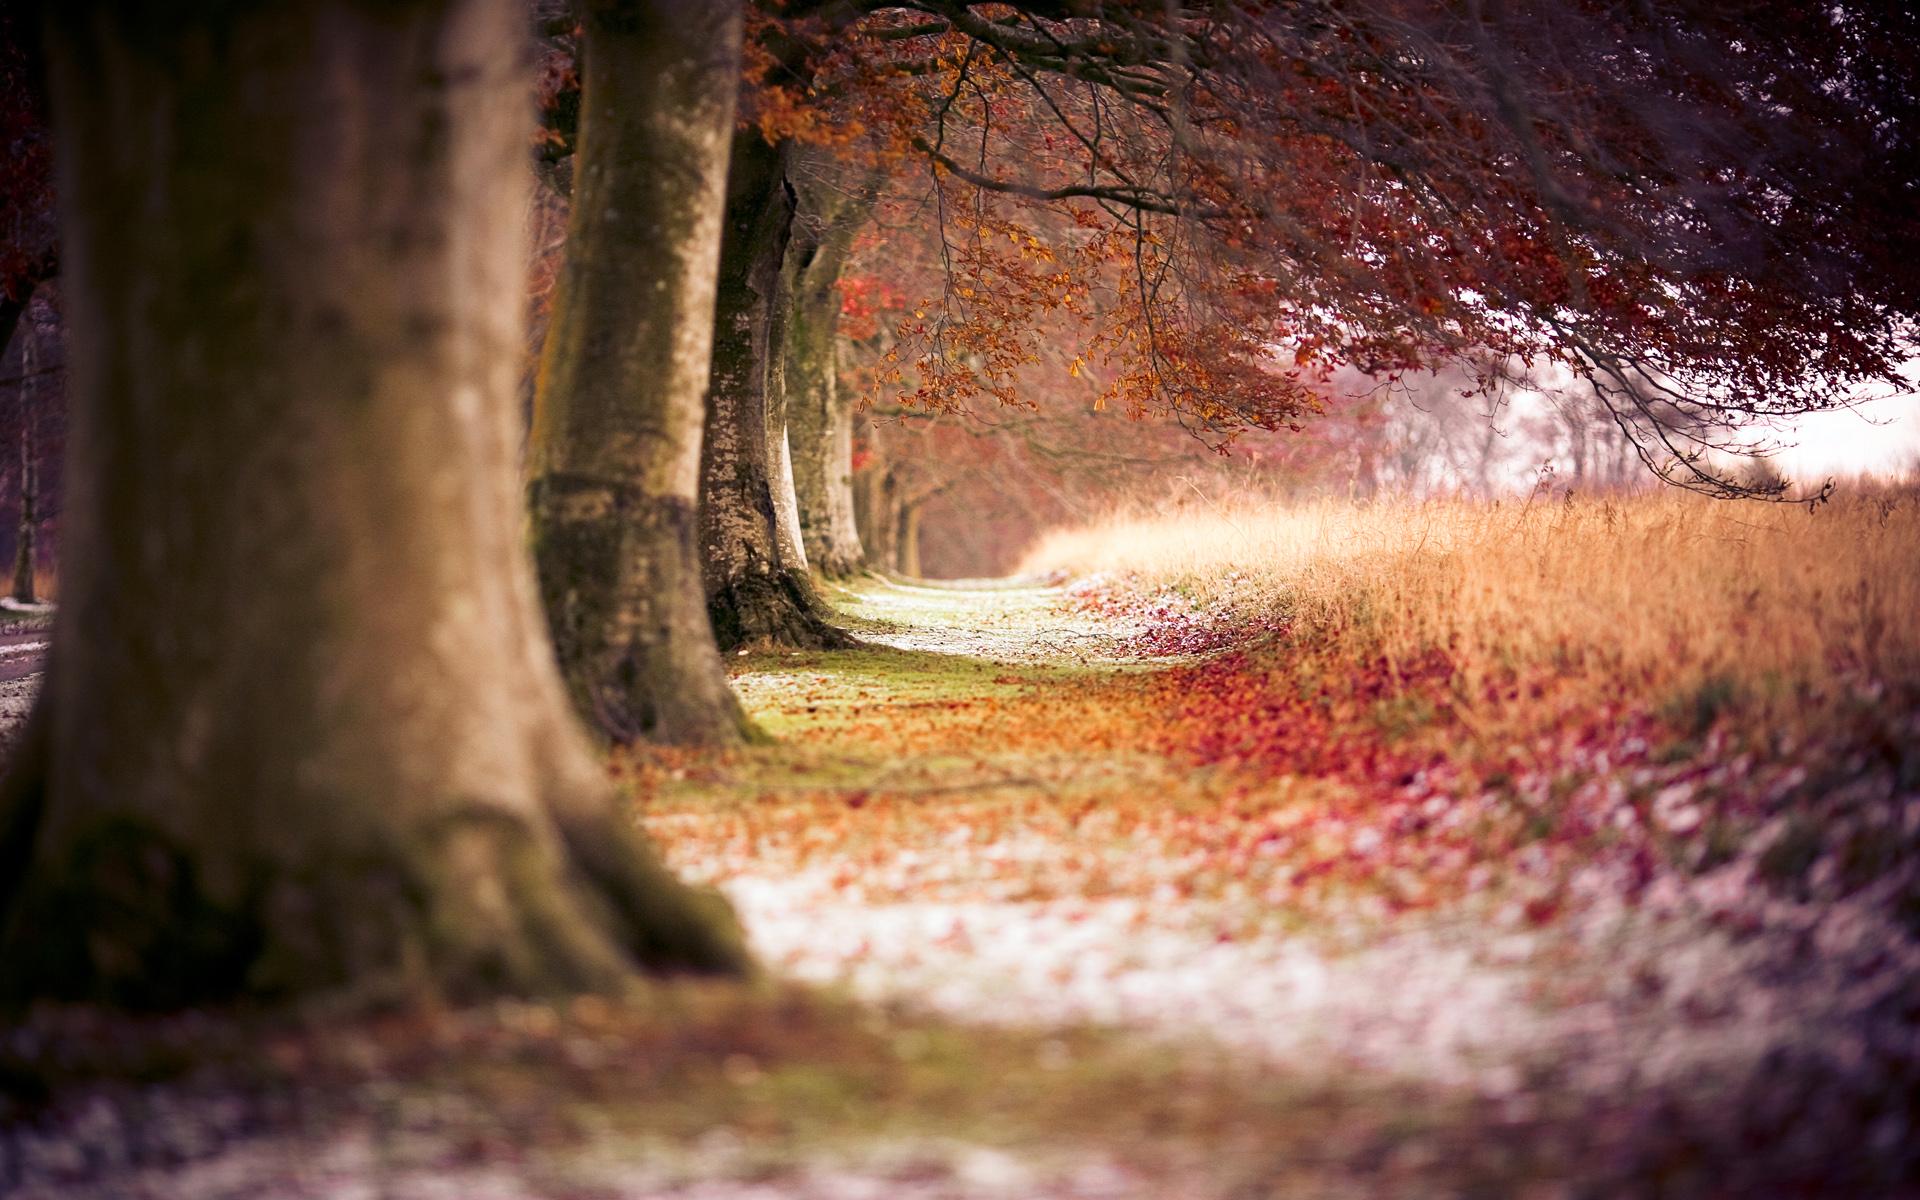 Hd wallpaper editing - Fall Trees Wallpaper Hd 29489